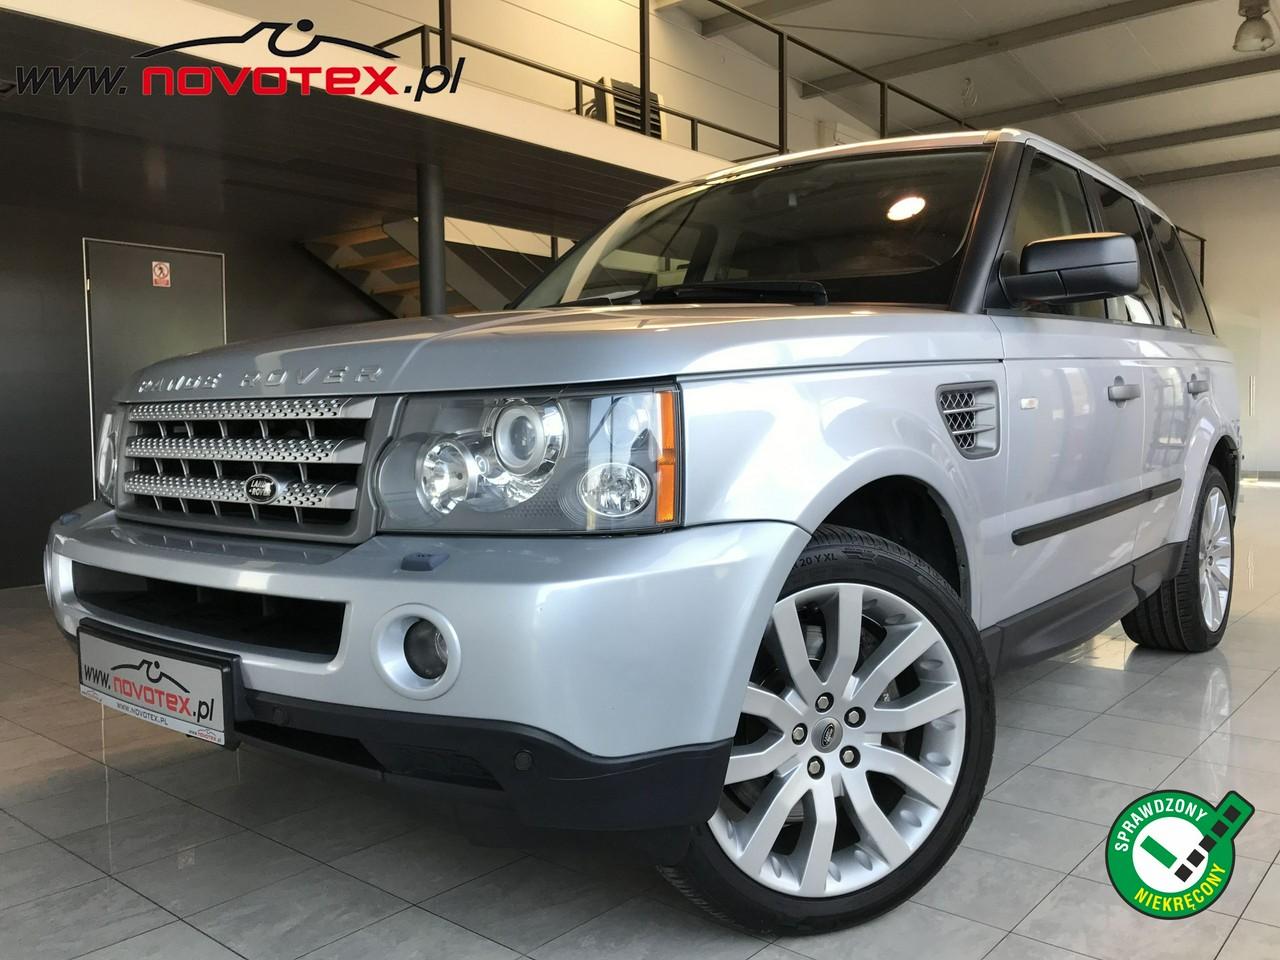 Land Rover Range Rover Sport 4.2 V8 Supercharged*xenon*ALU 20*nowe opony*bezwypadkowy